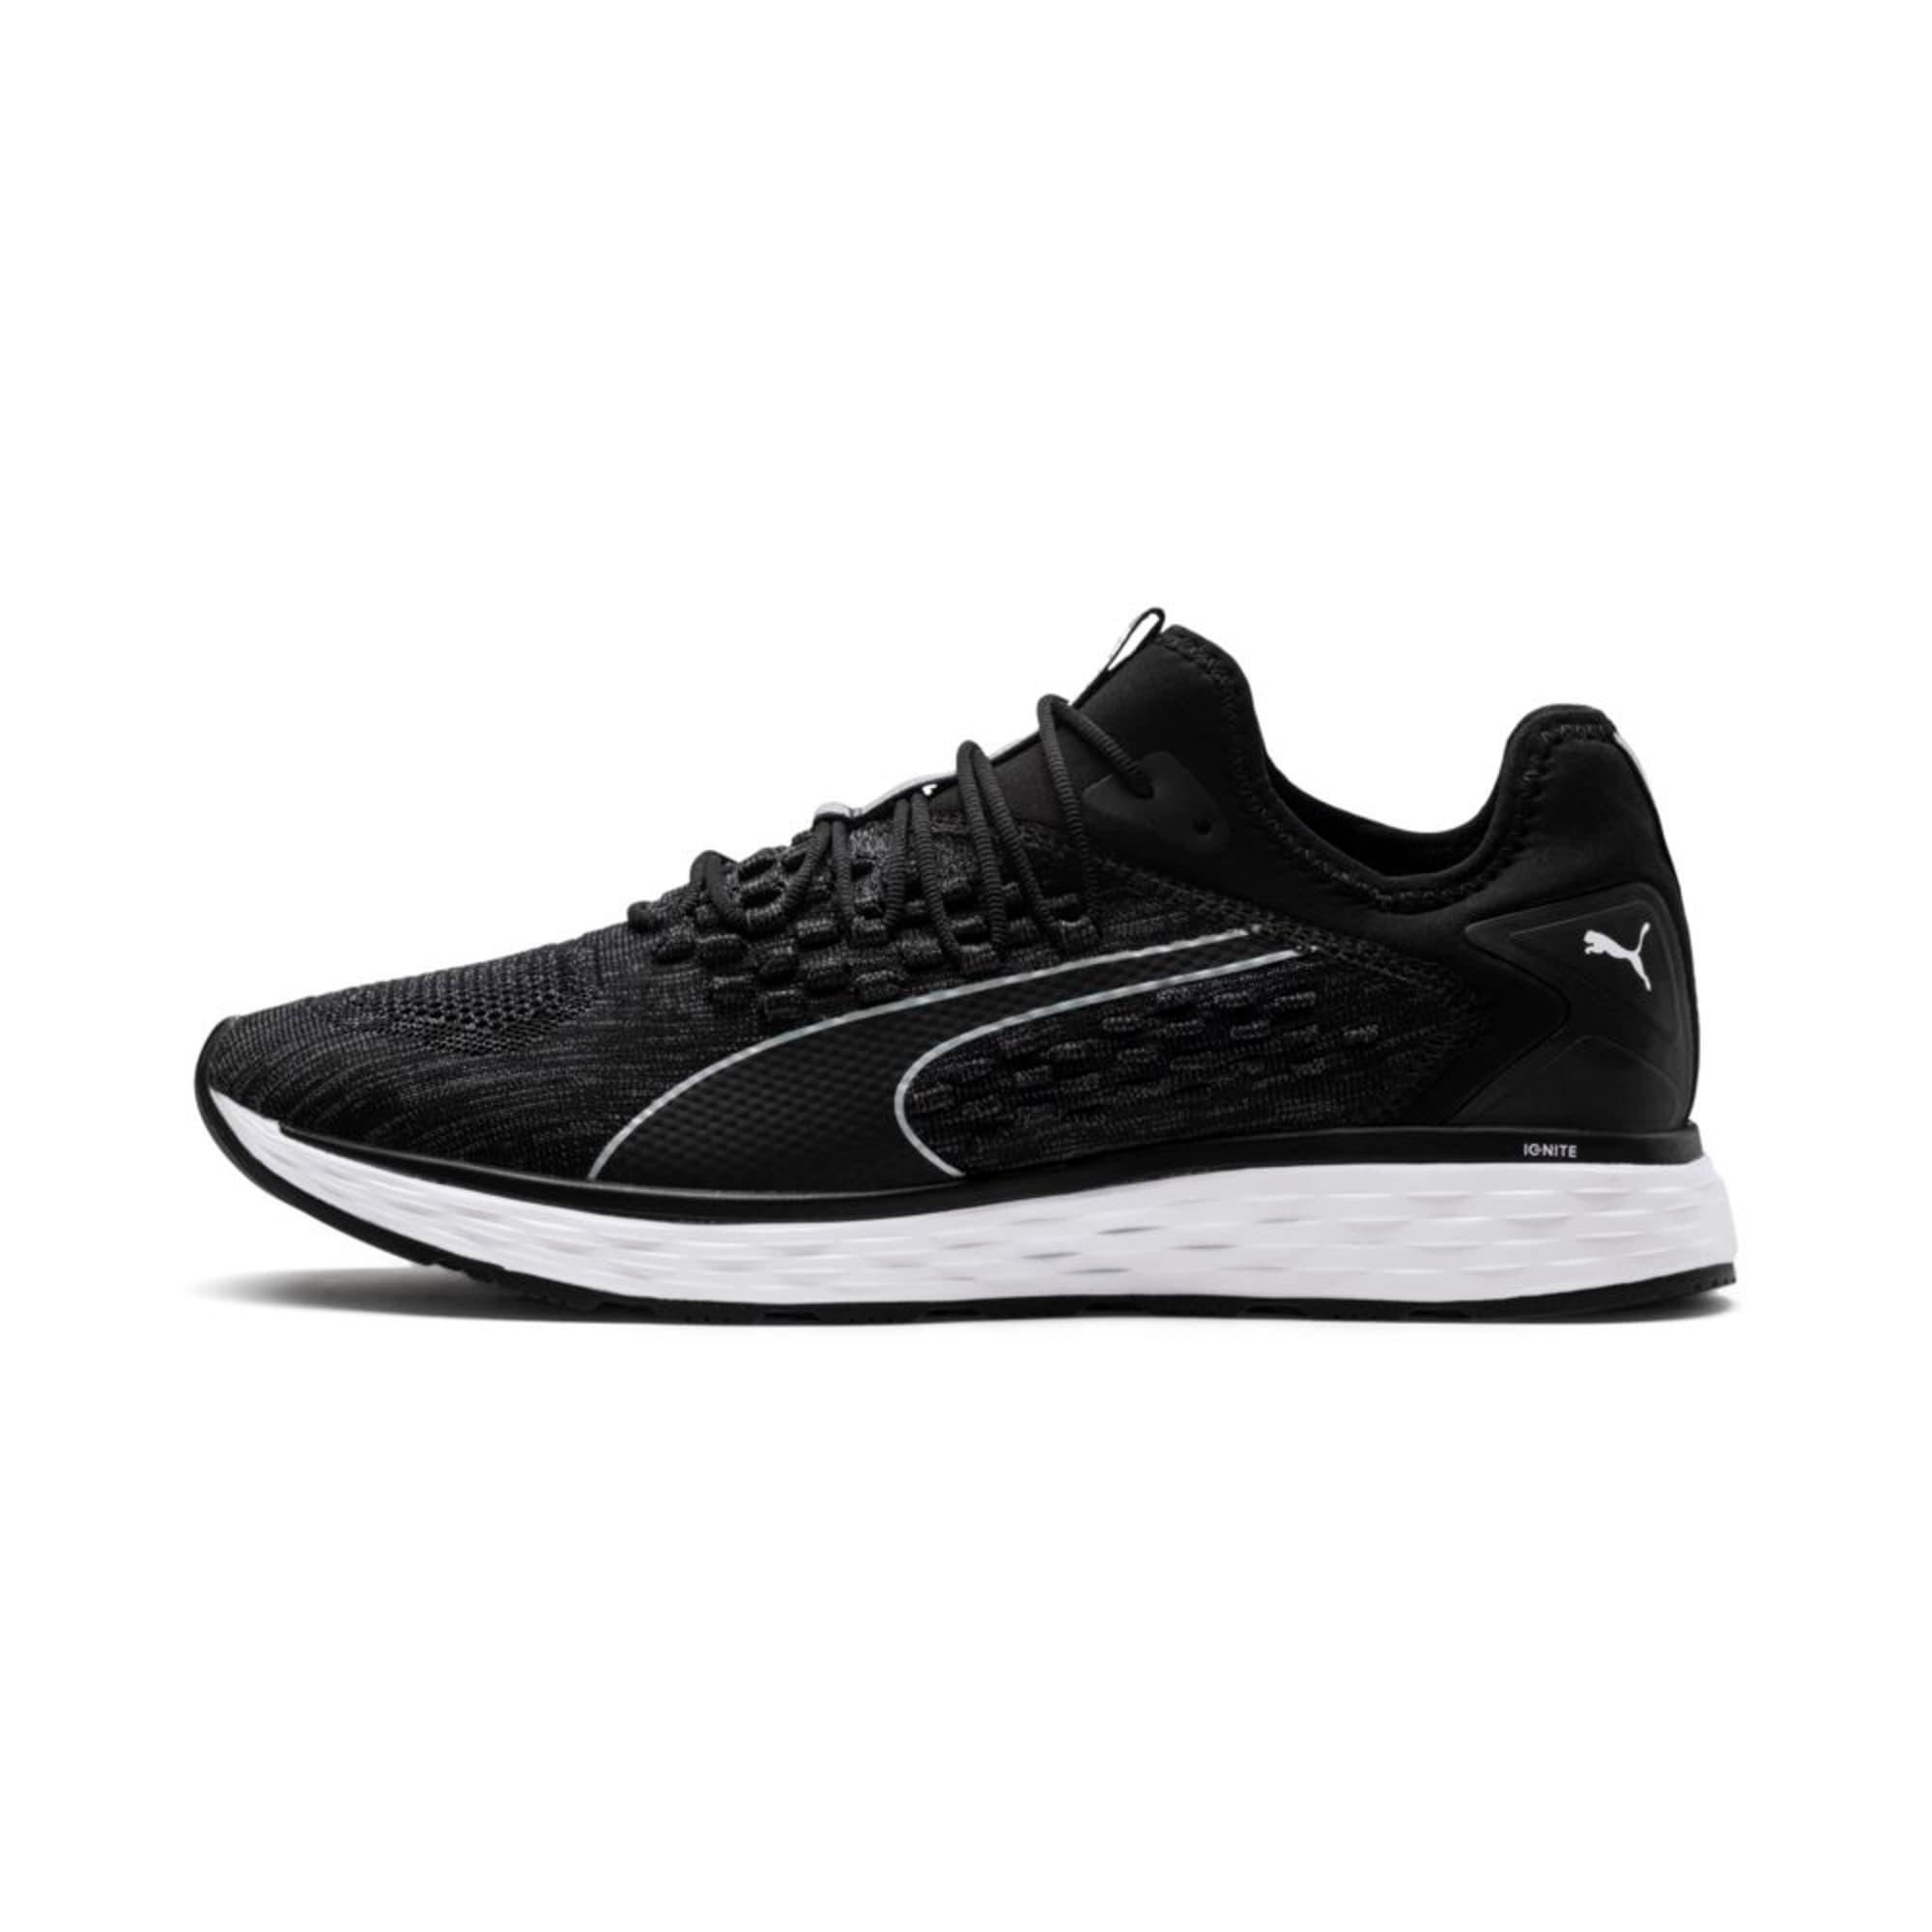 Thumbnail 1 of SPEED FUSEFIT Men's Running Shoes, Puma Black-Iron Gate, medium-IND